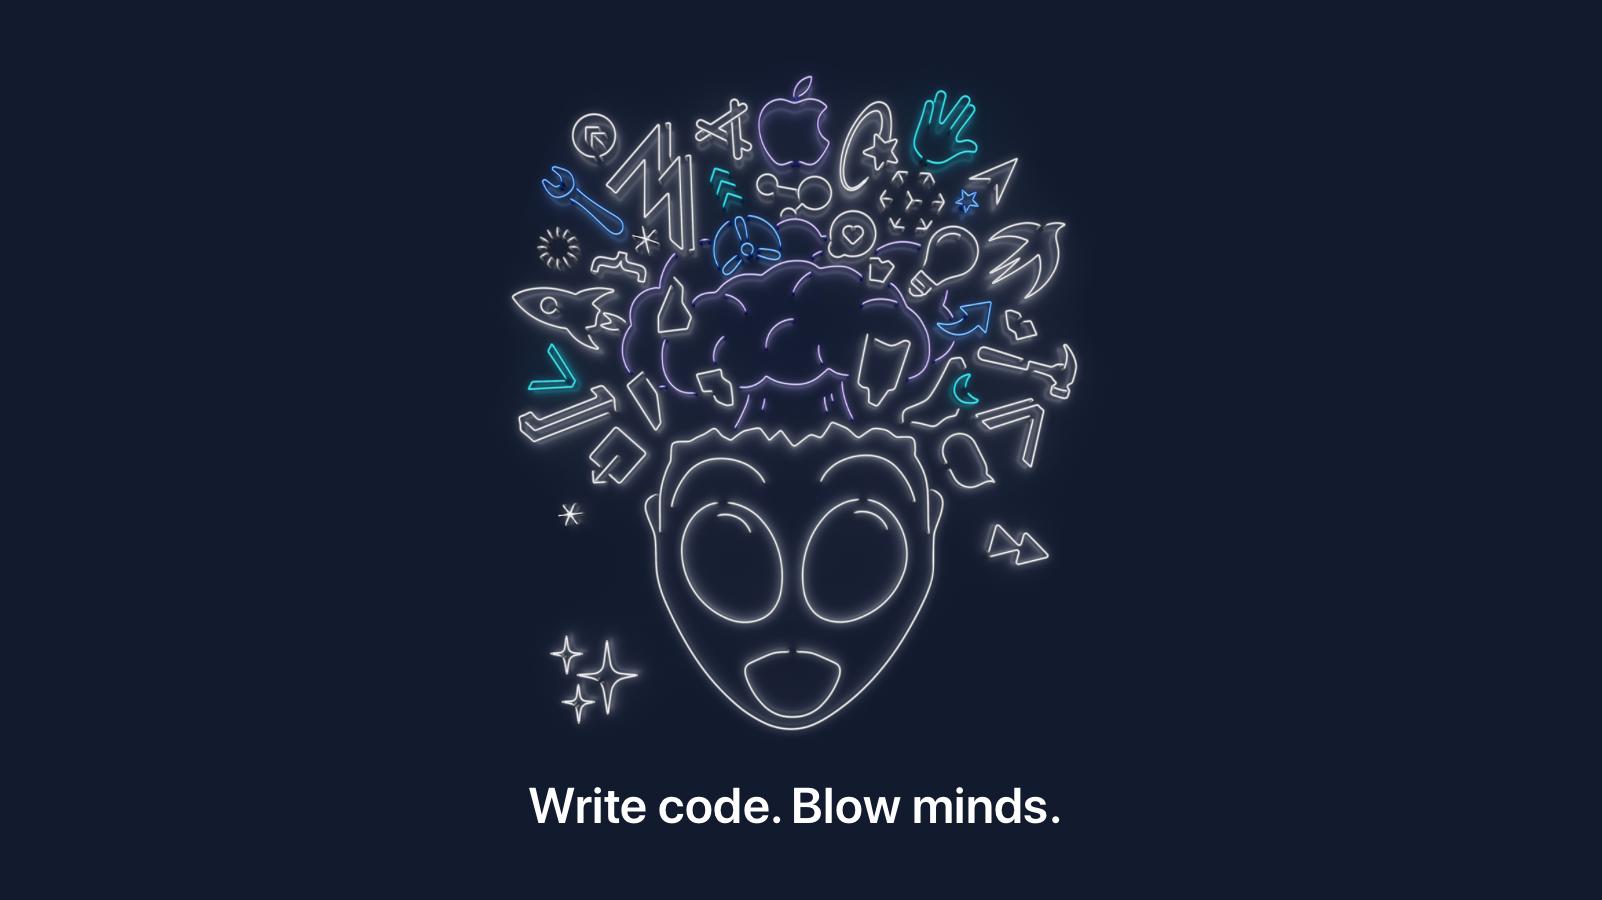 WWDC 2019 social 16x9